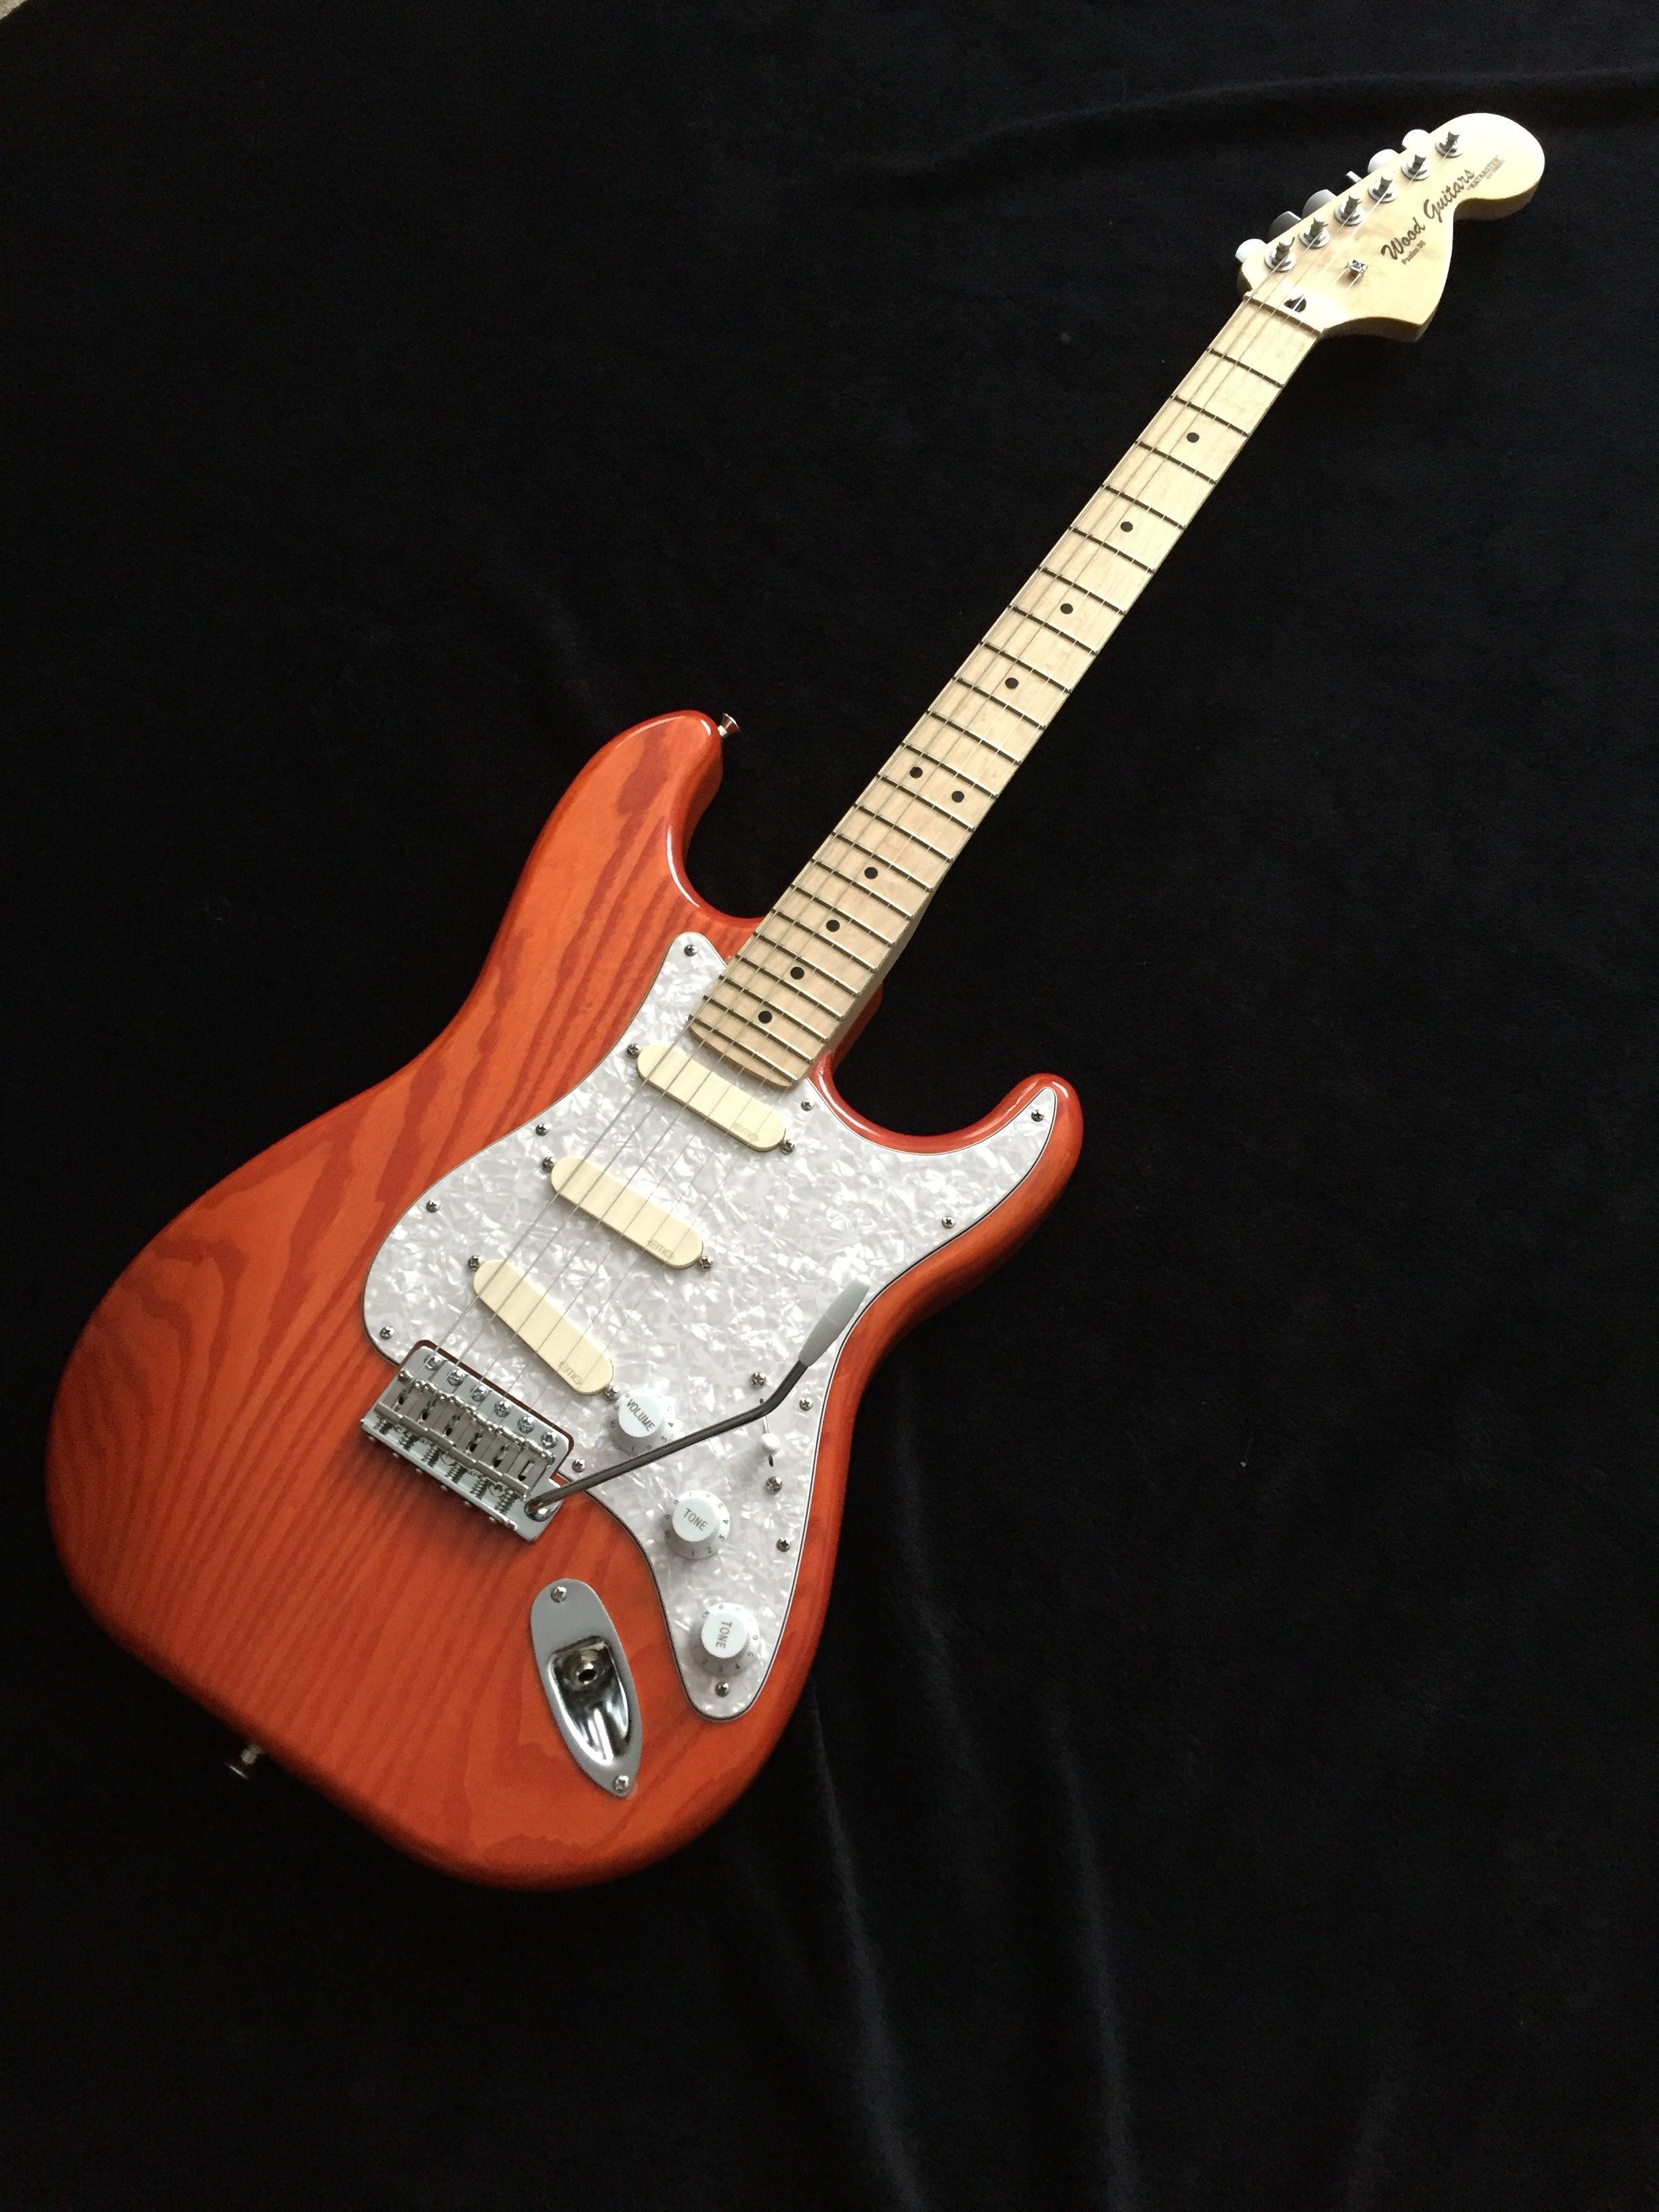 Swamp Ash Stratocaster, Maple neck, EMG David Gilmour